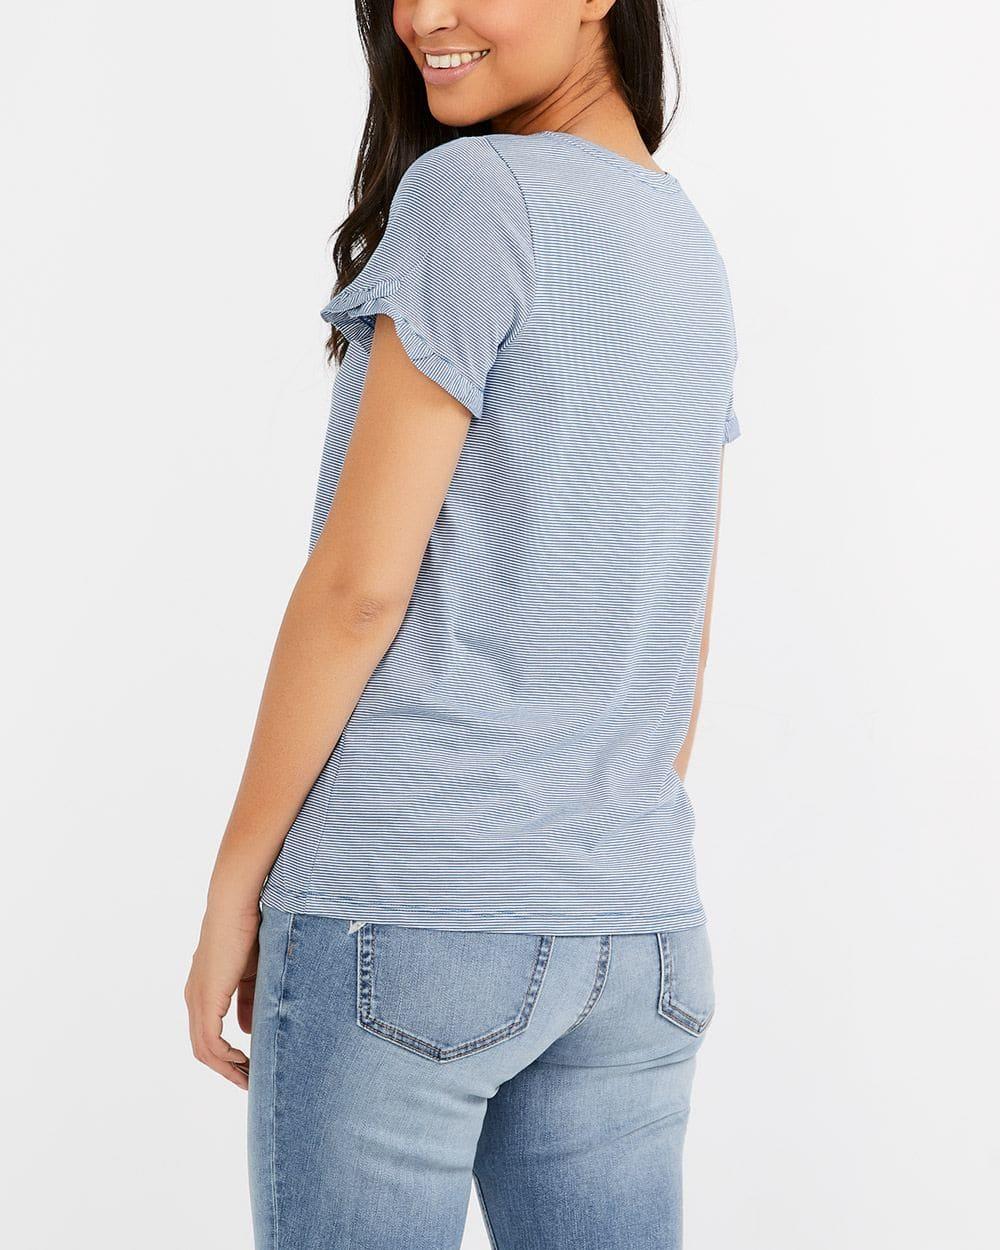 Applique Striped T-Shirt